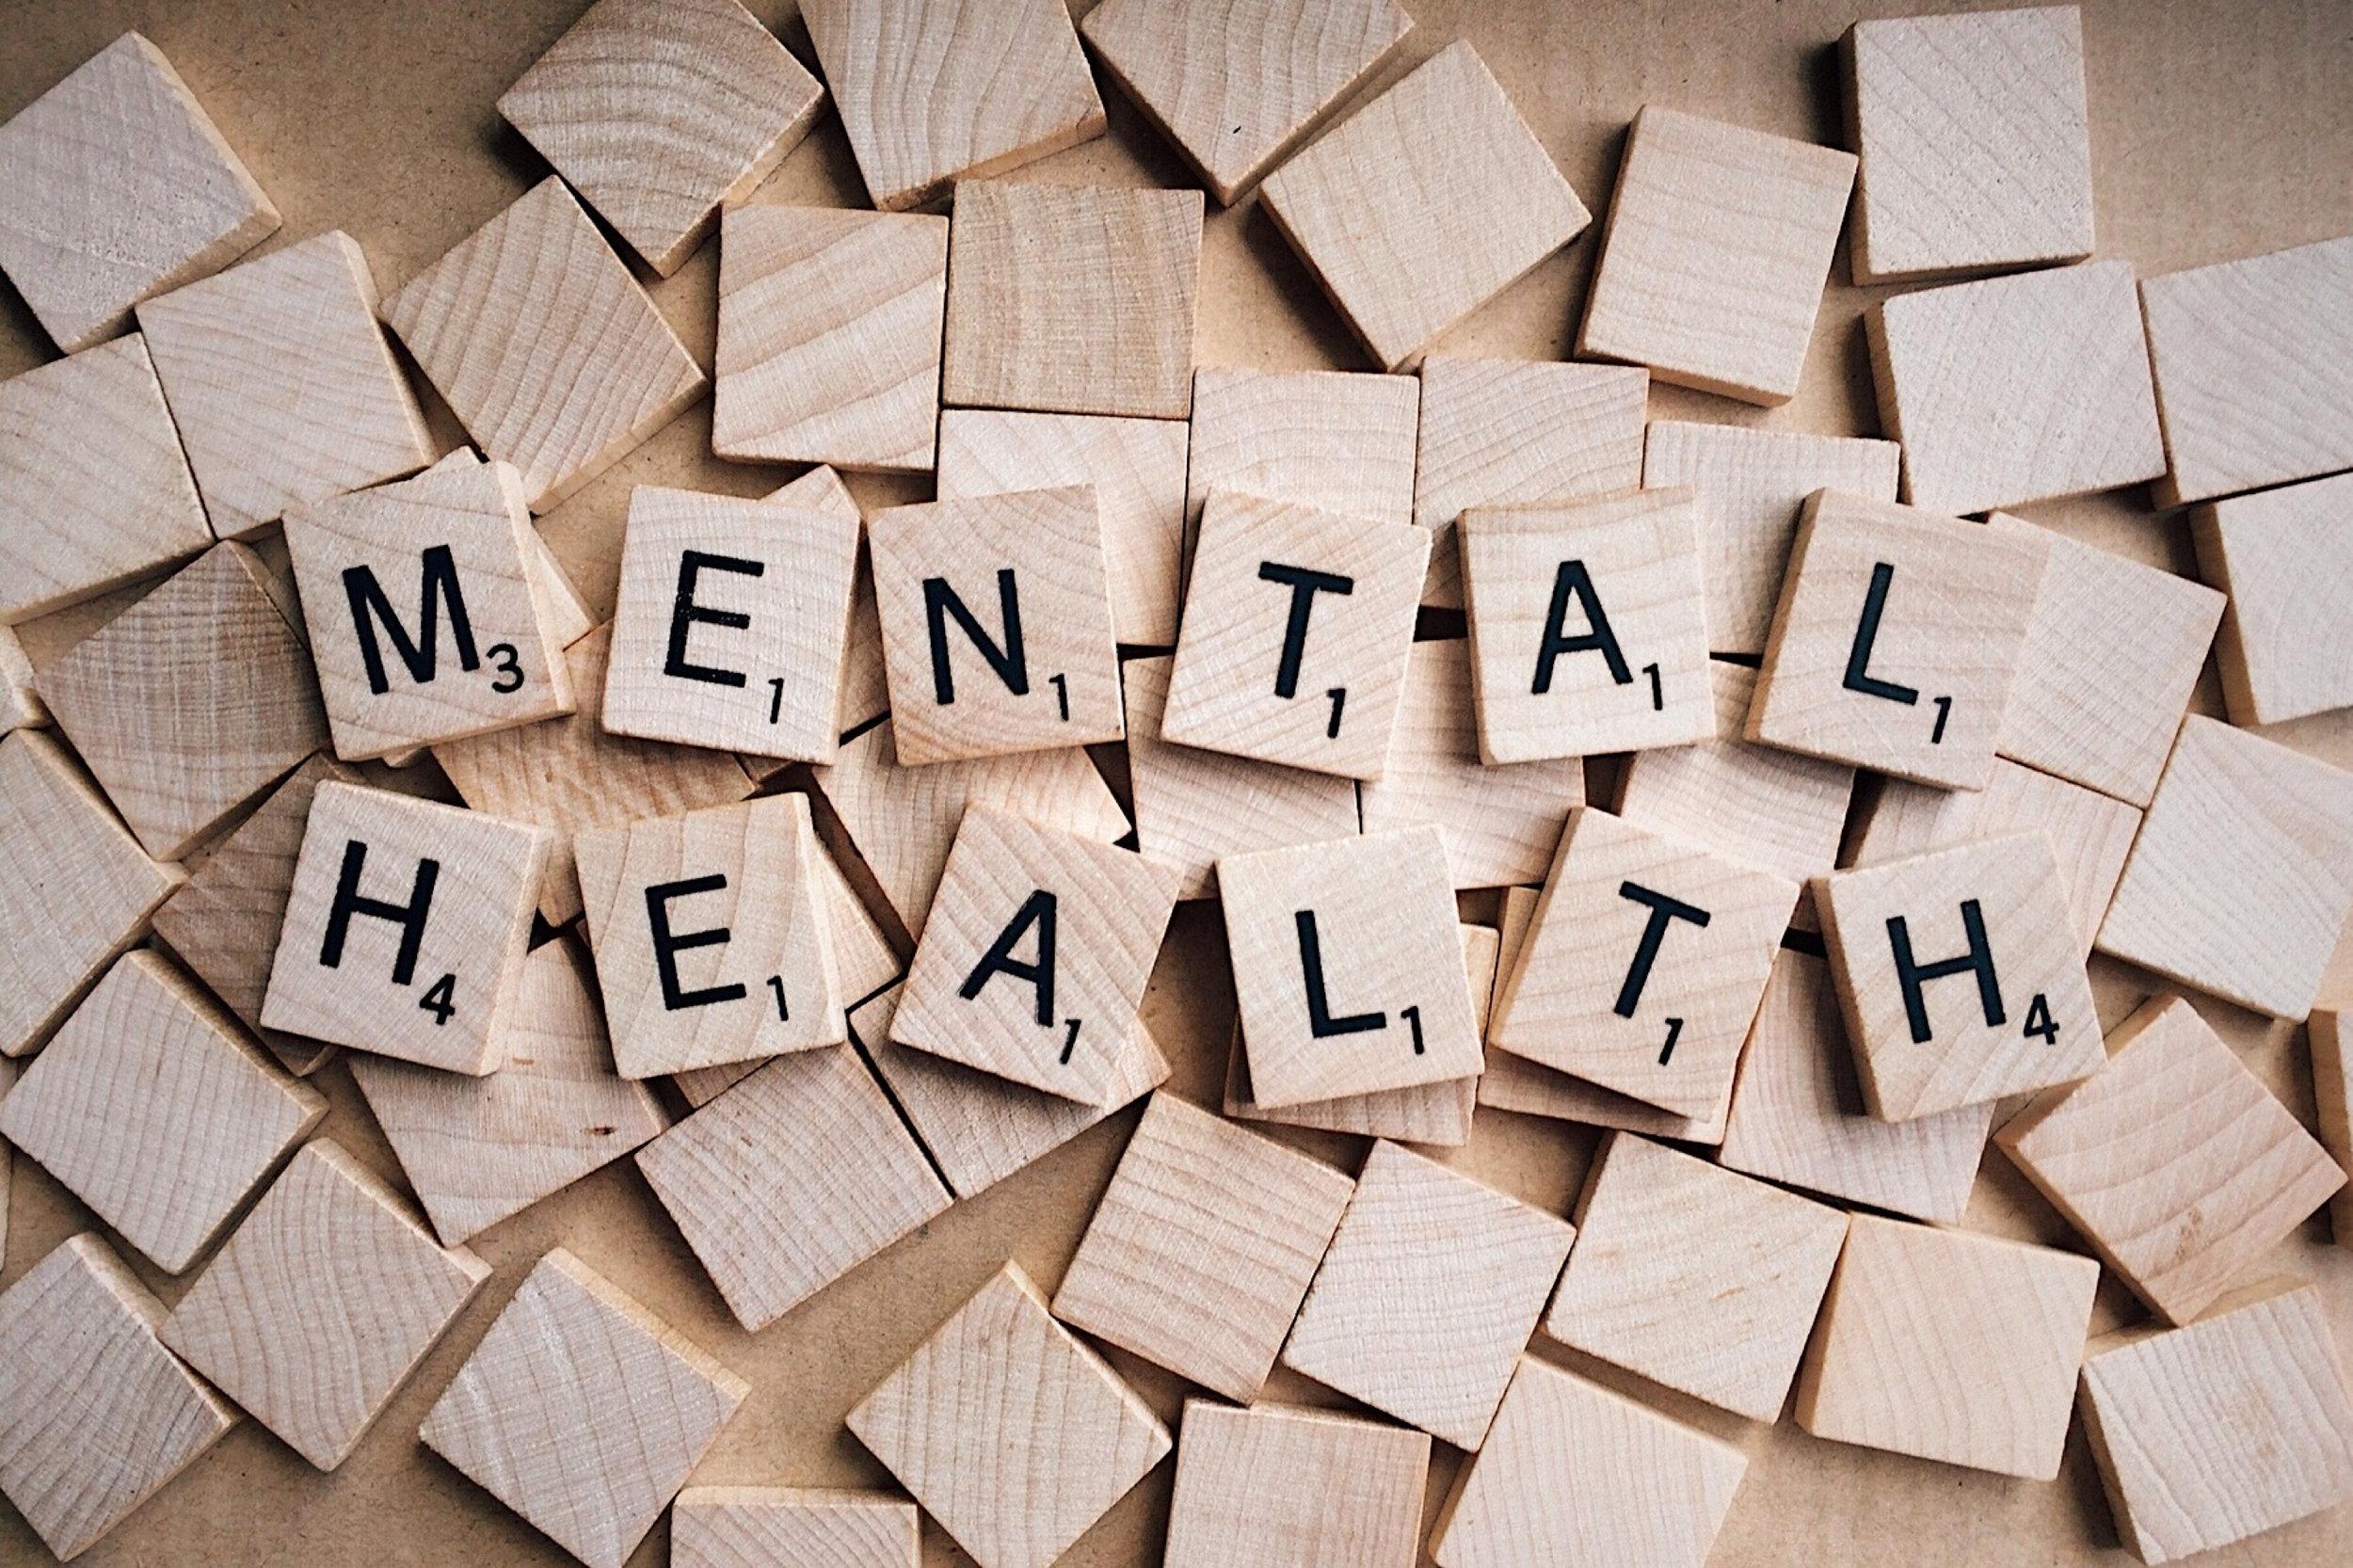 Mental Health Spelled Out in Scrabble Letters.jpg